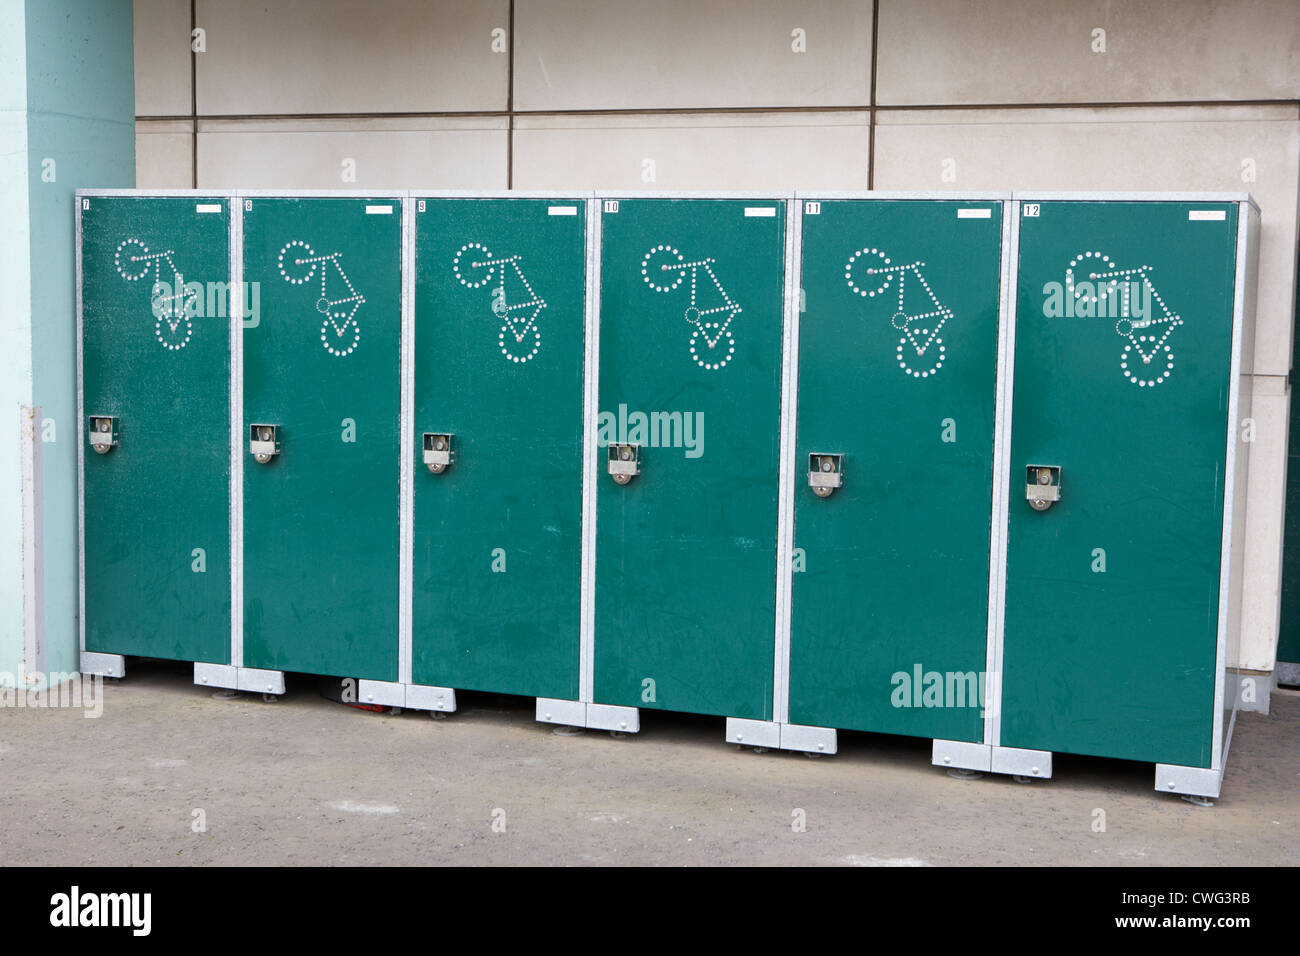 Bicycle Bike Storage Lockers At A Work Place Building In Edinburgh,  Scotland, Uk, United Kingdom